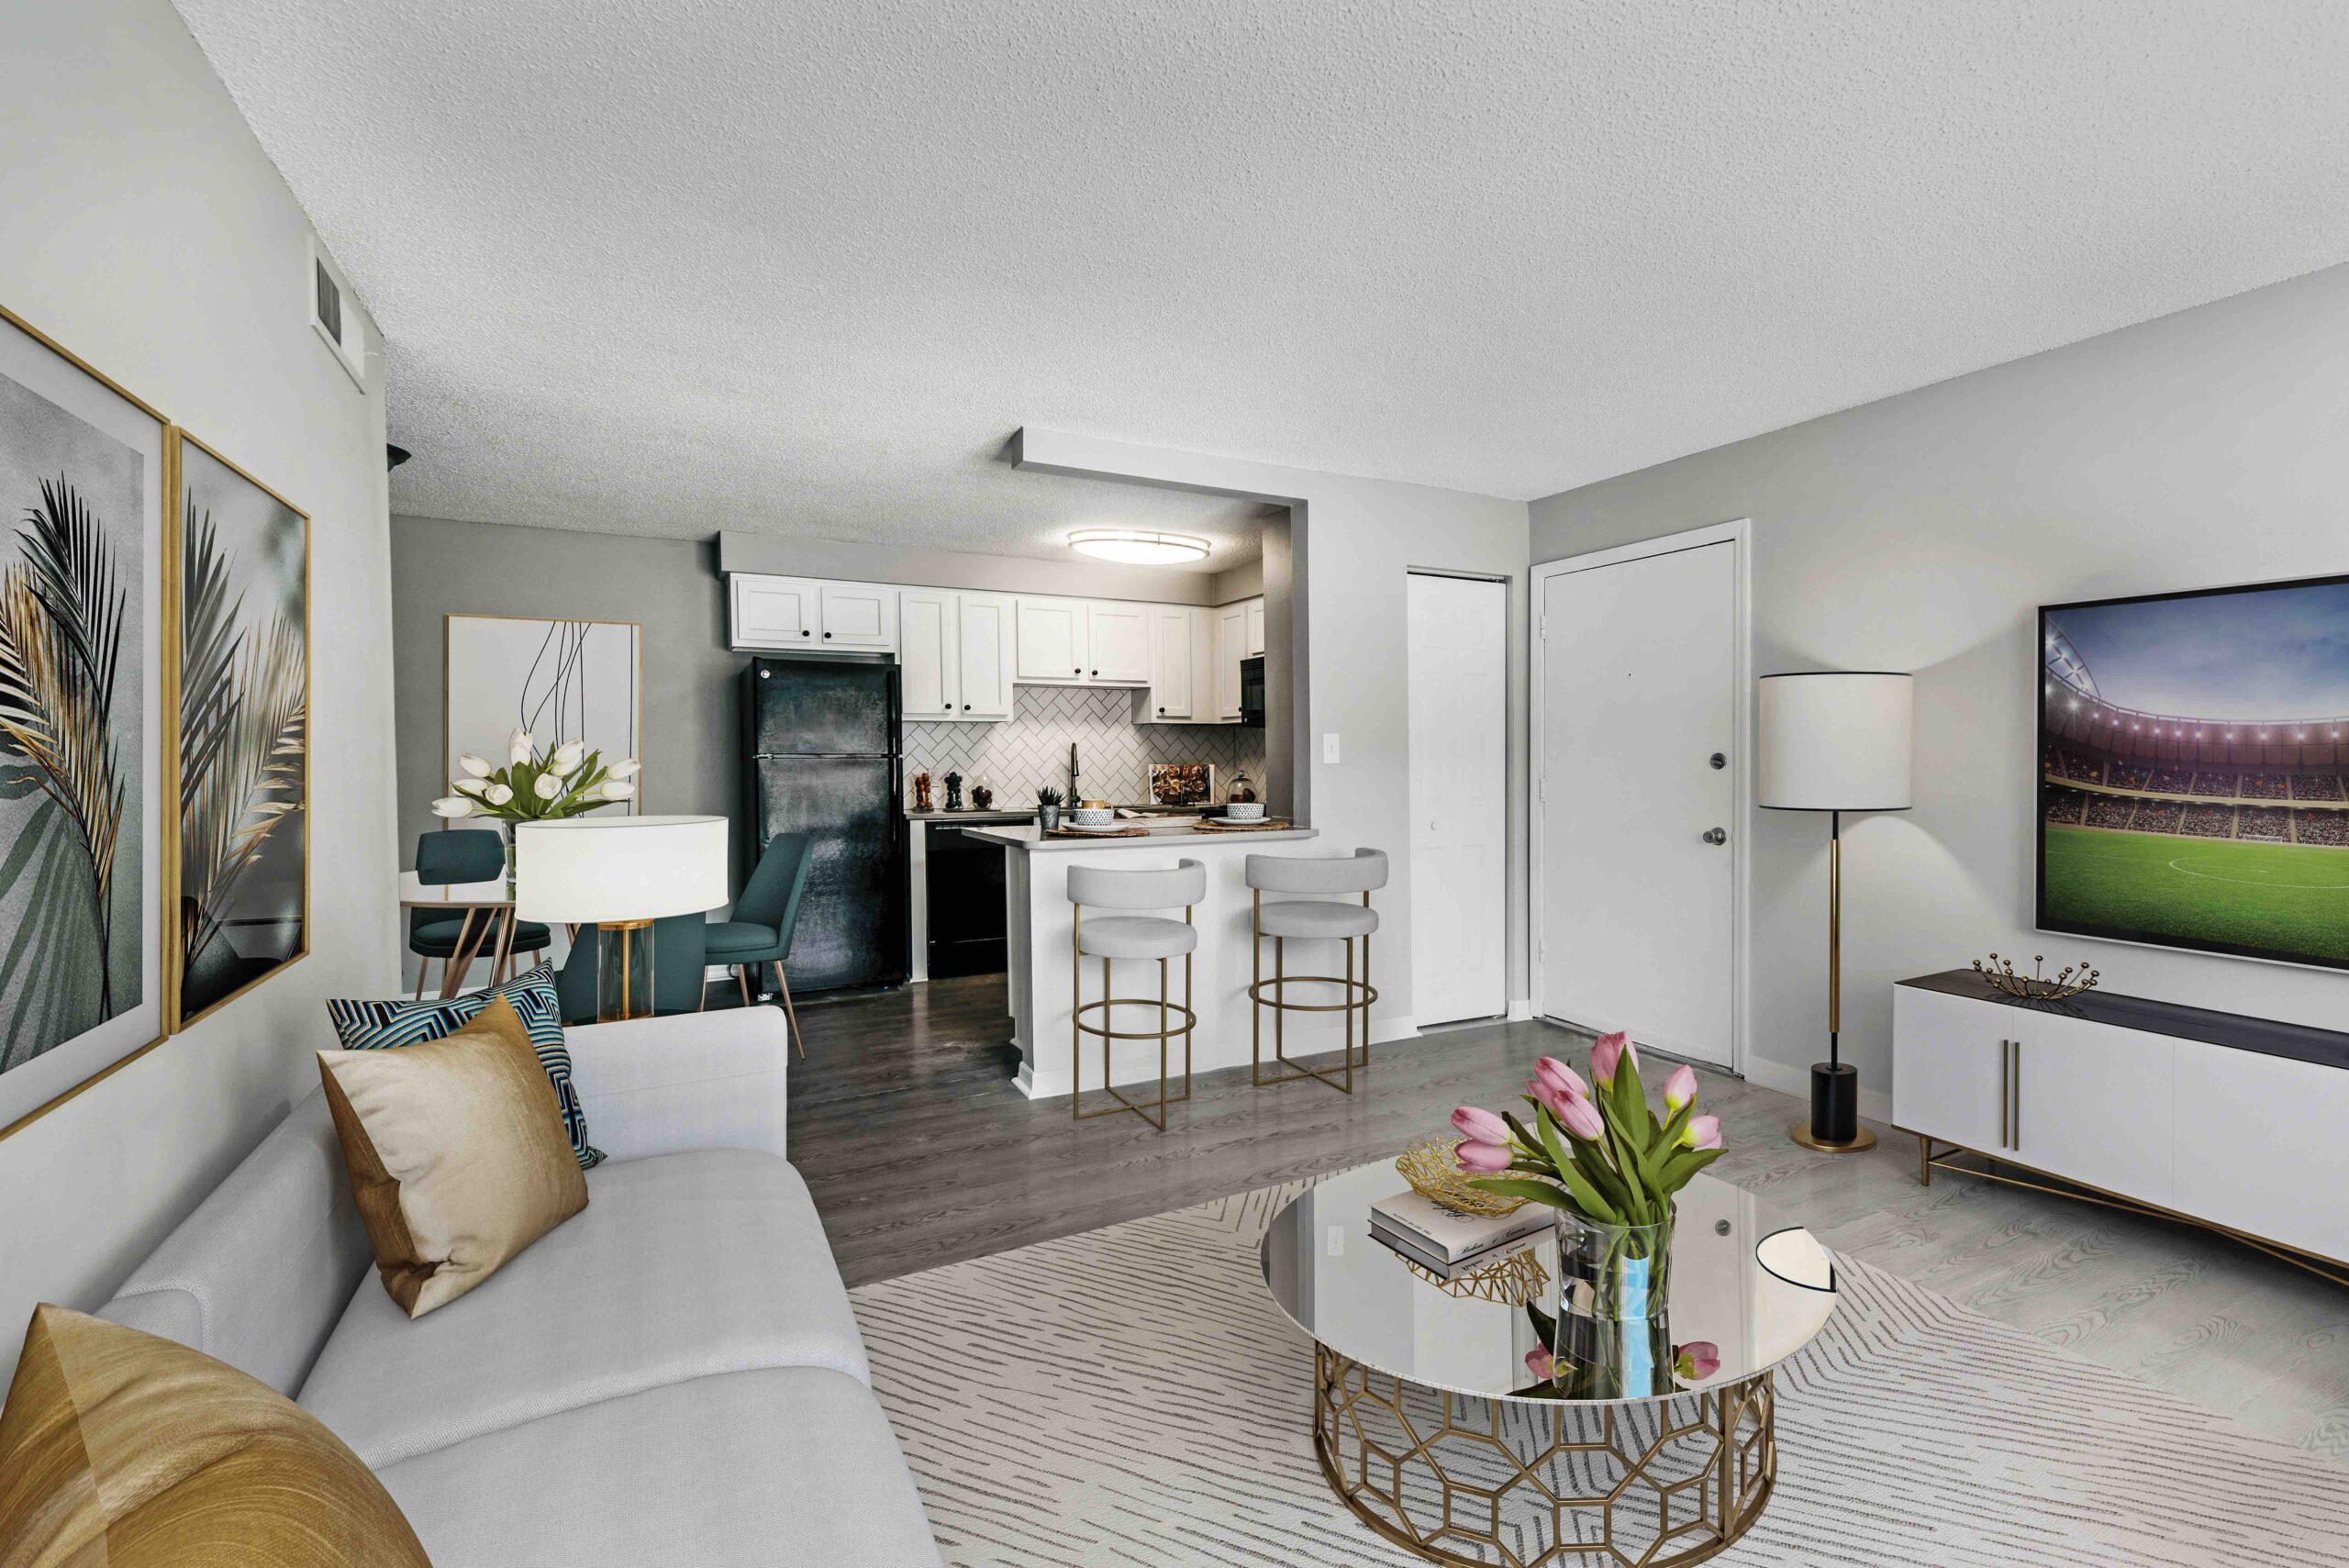 Livingroom of Model Apartment